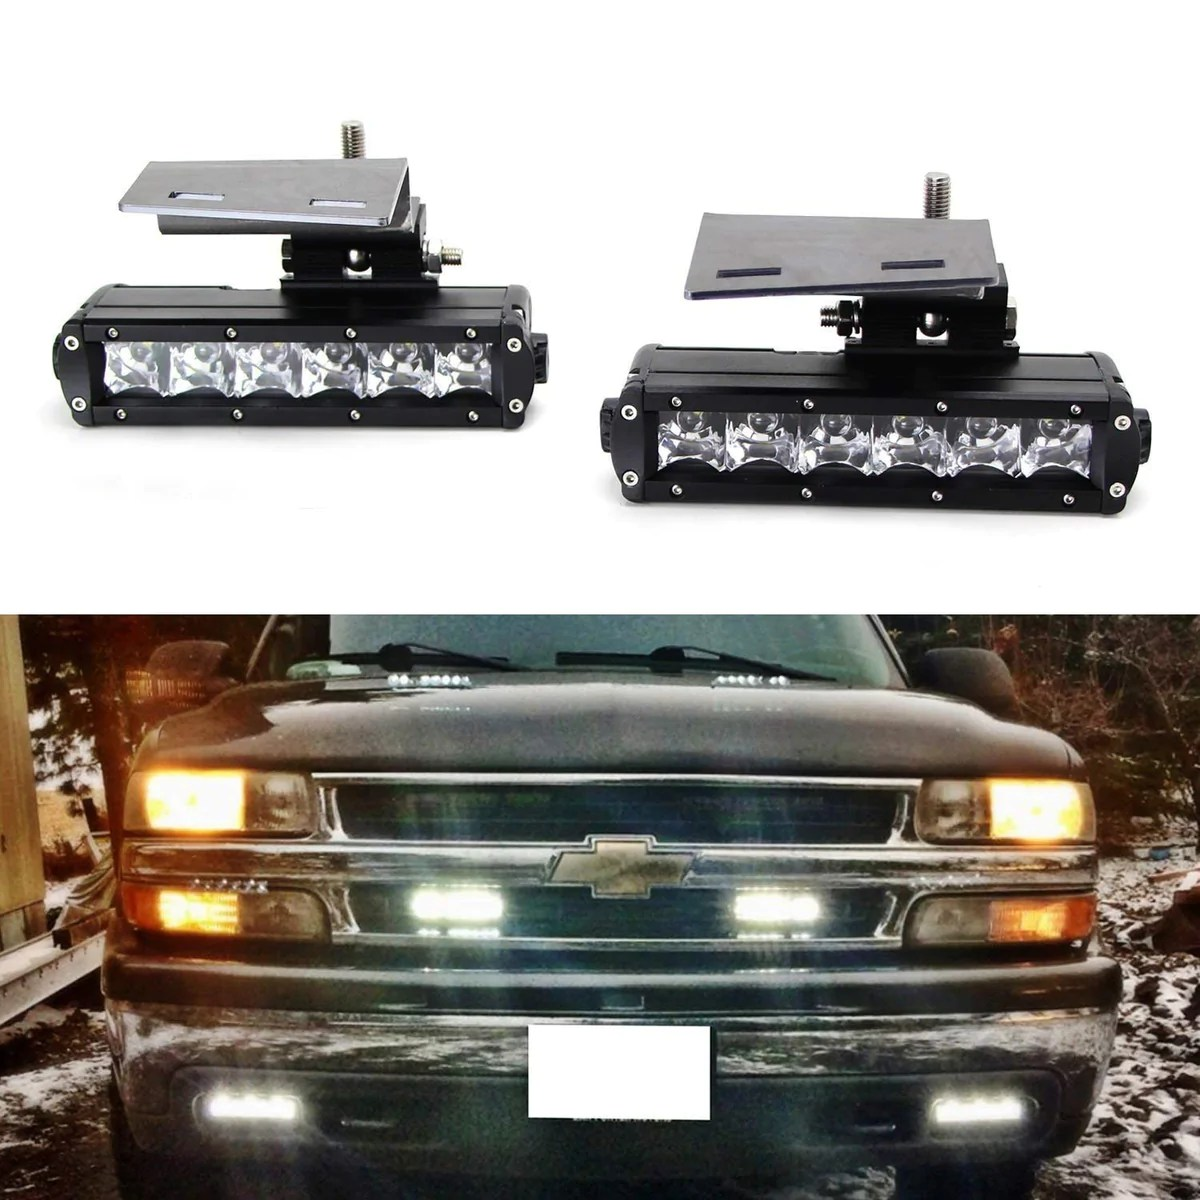 led light bar fog lamps kit for 99 02 chevrolet silverado 1500 2500 00 01 3500 00 2006 suburban tahoe includes 2 30w cree led light bars  [ 1200 x 1200 Pixel ]